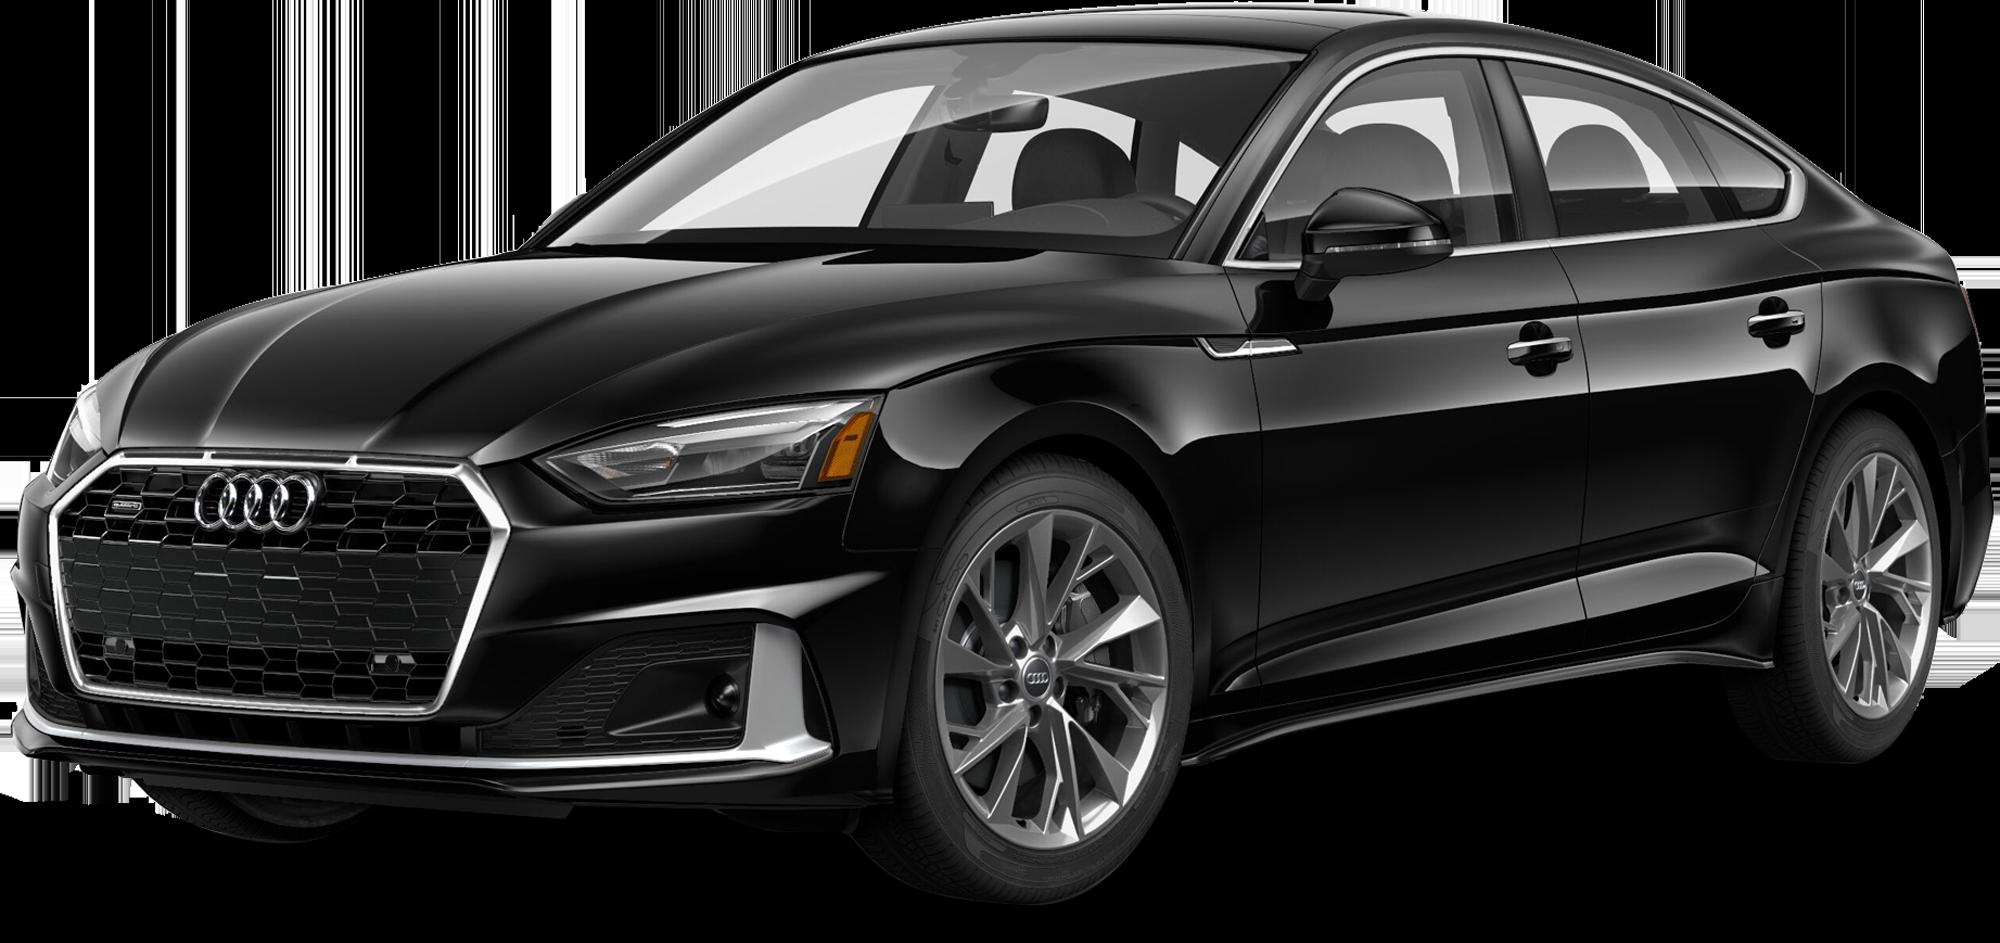 2020 Audi A5 Incentives Specials Offers In Virginia Beach Va